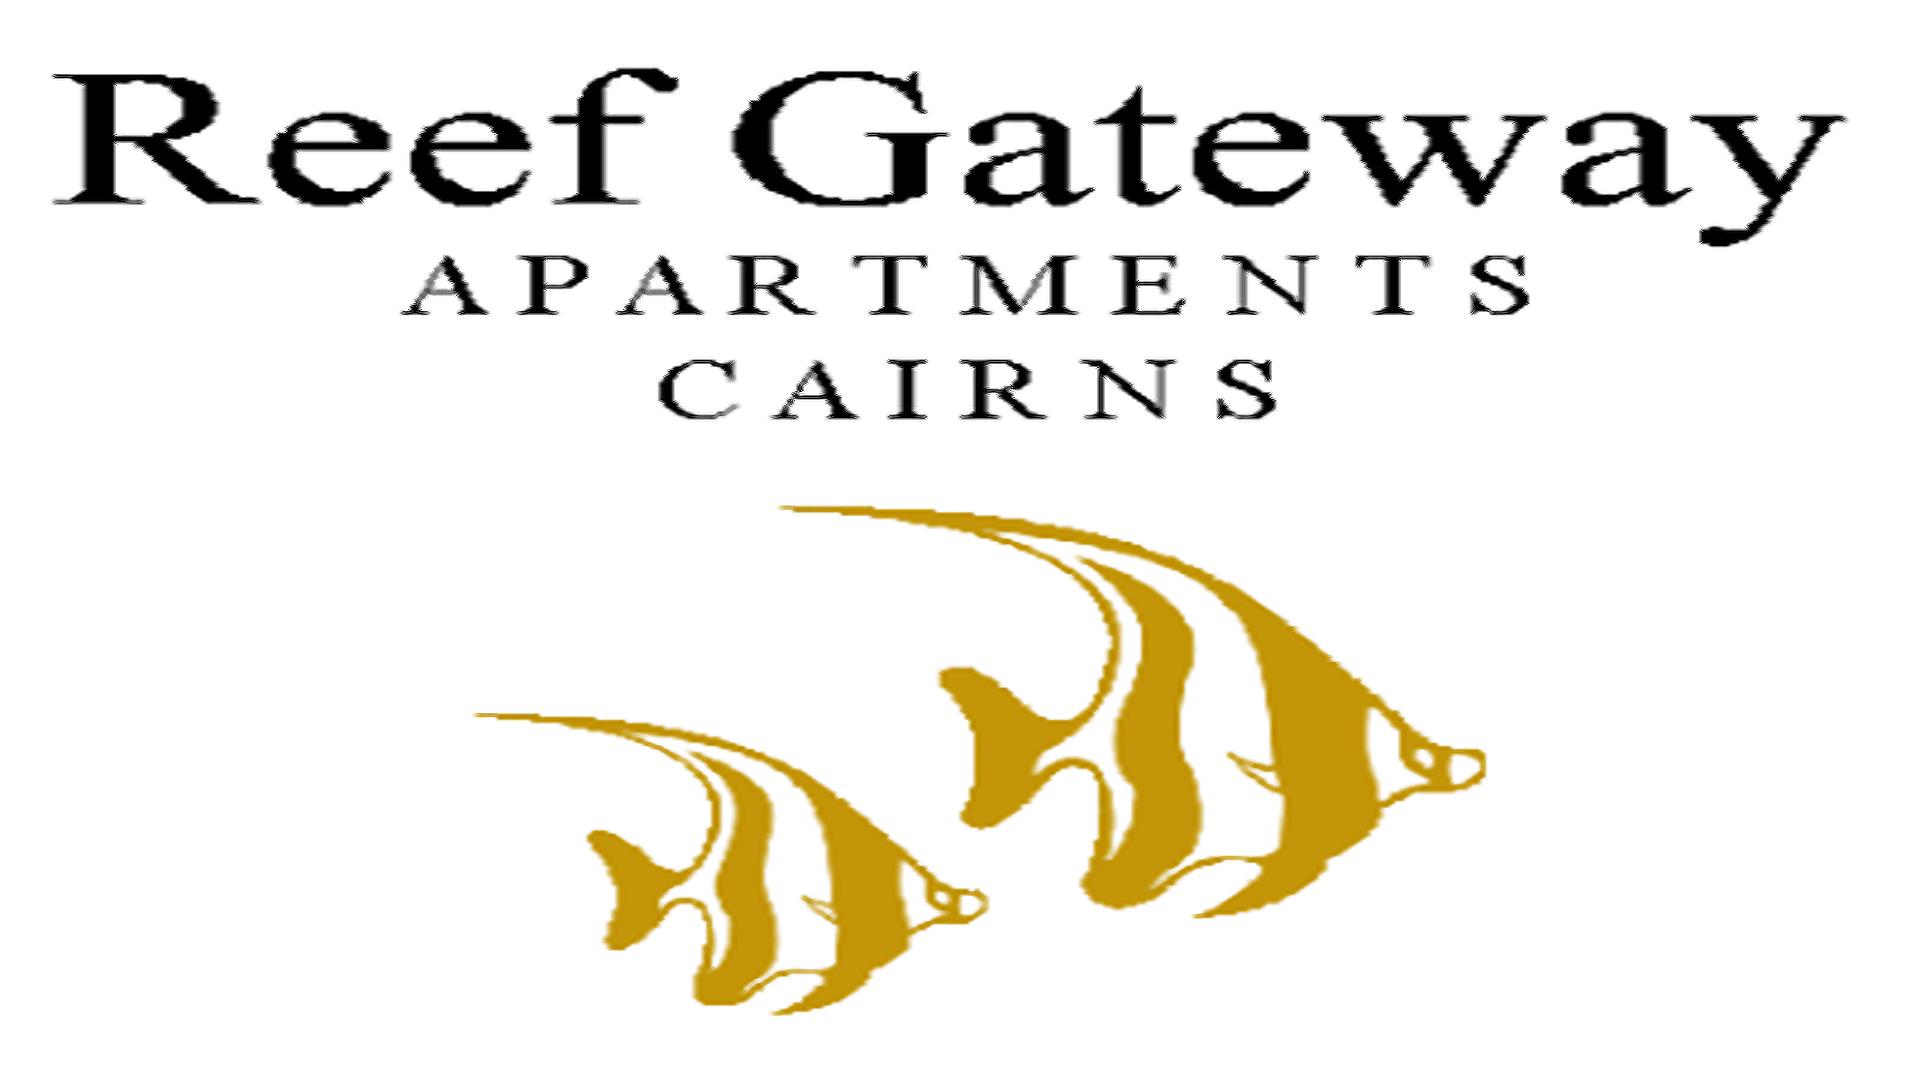 Reef Gateway